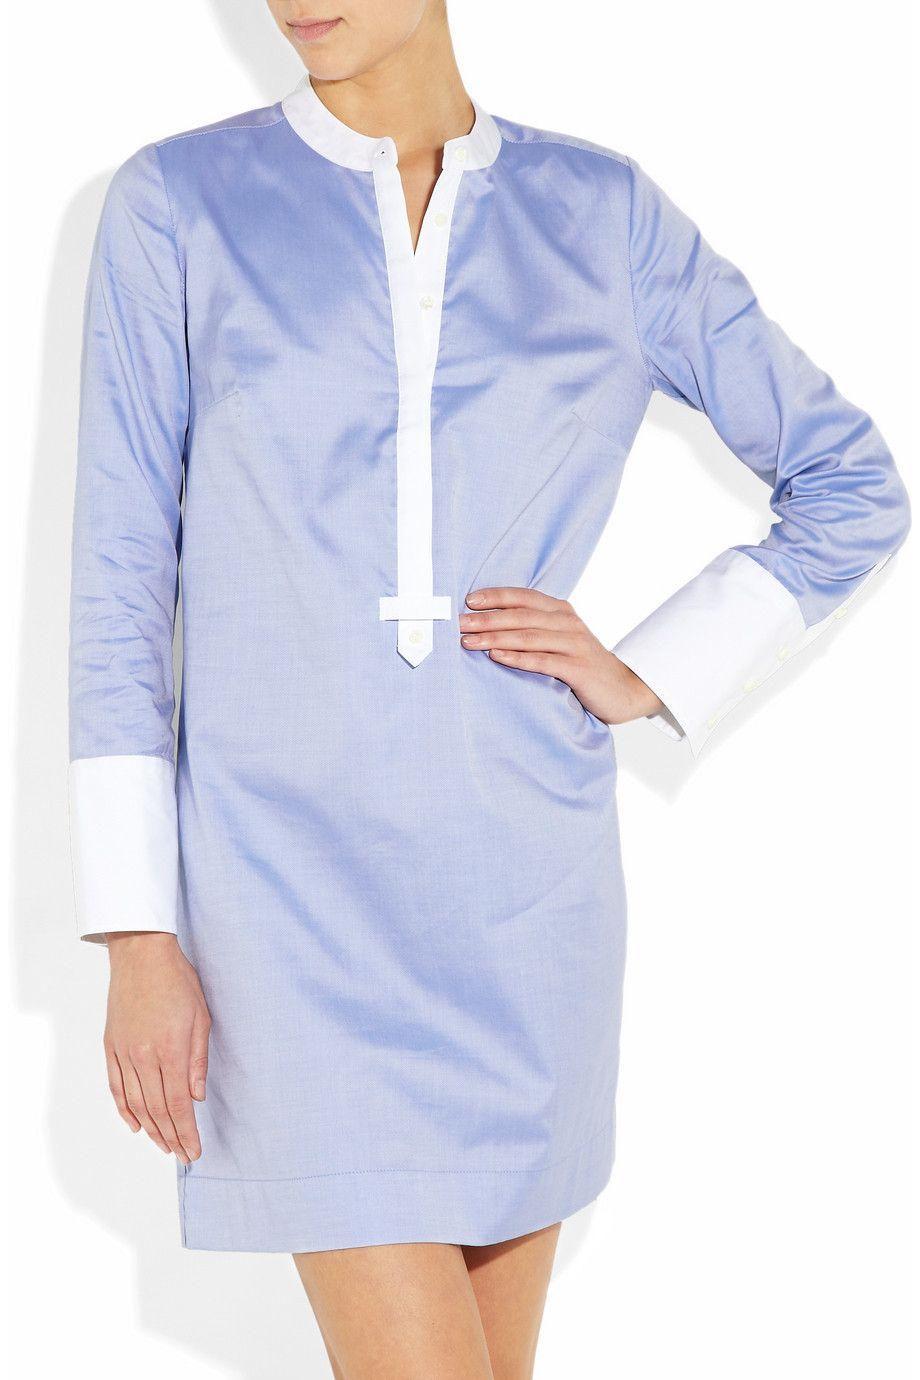 Jcrew shelly cotton shirt dress needs a skinny belt moda